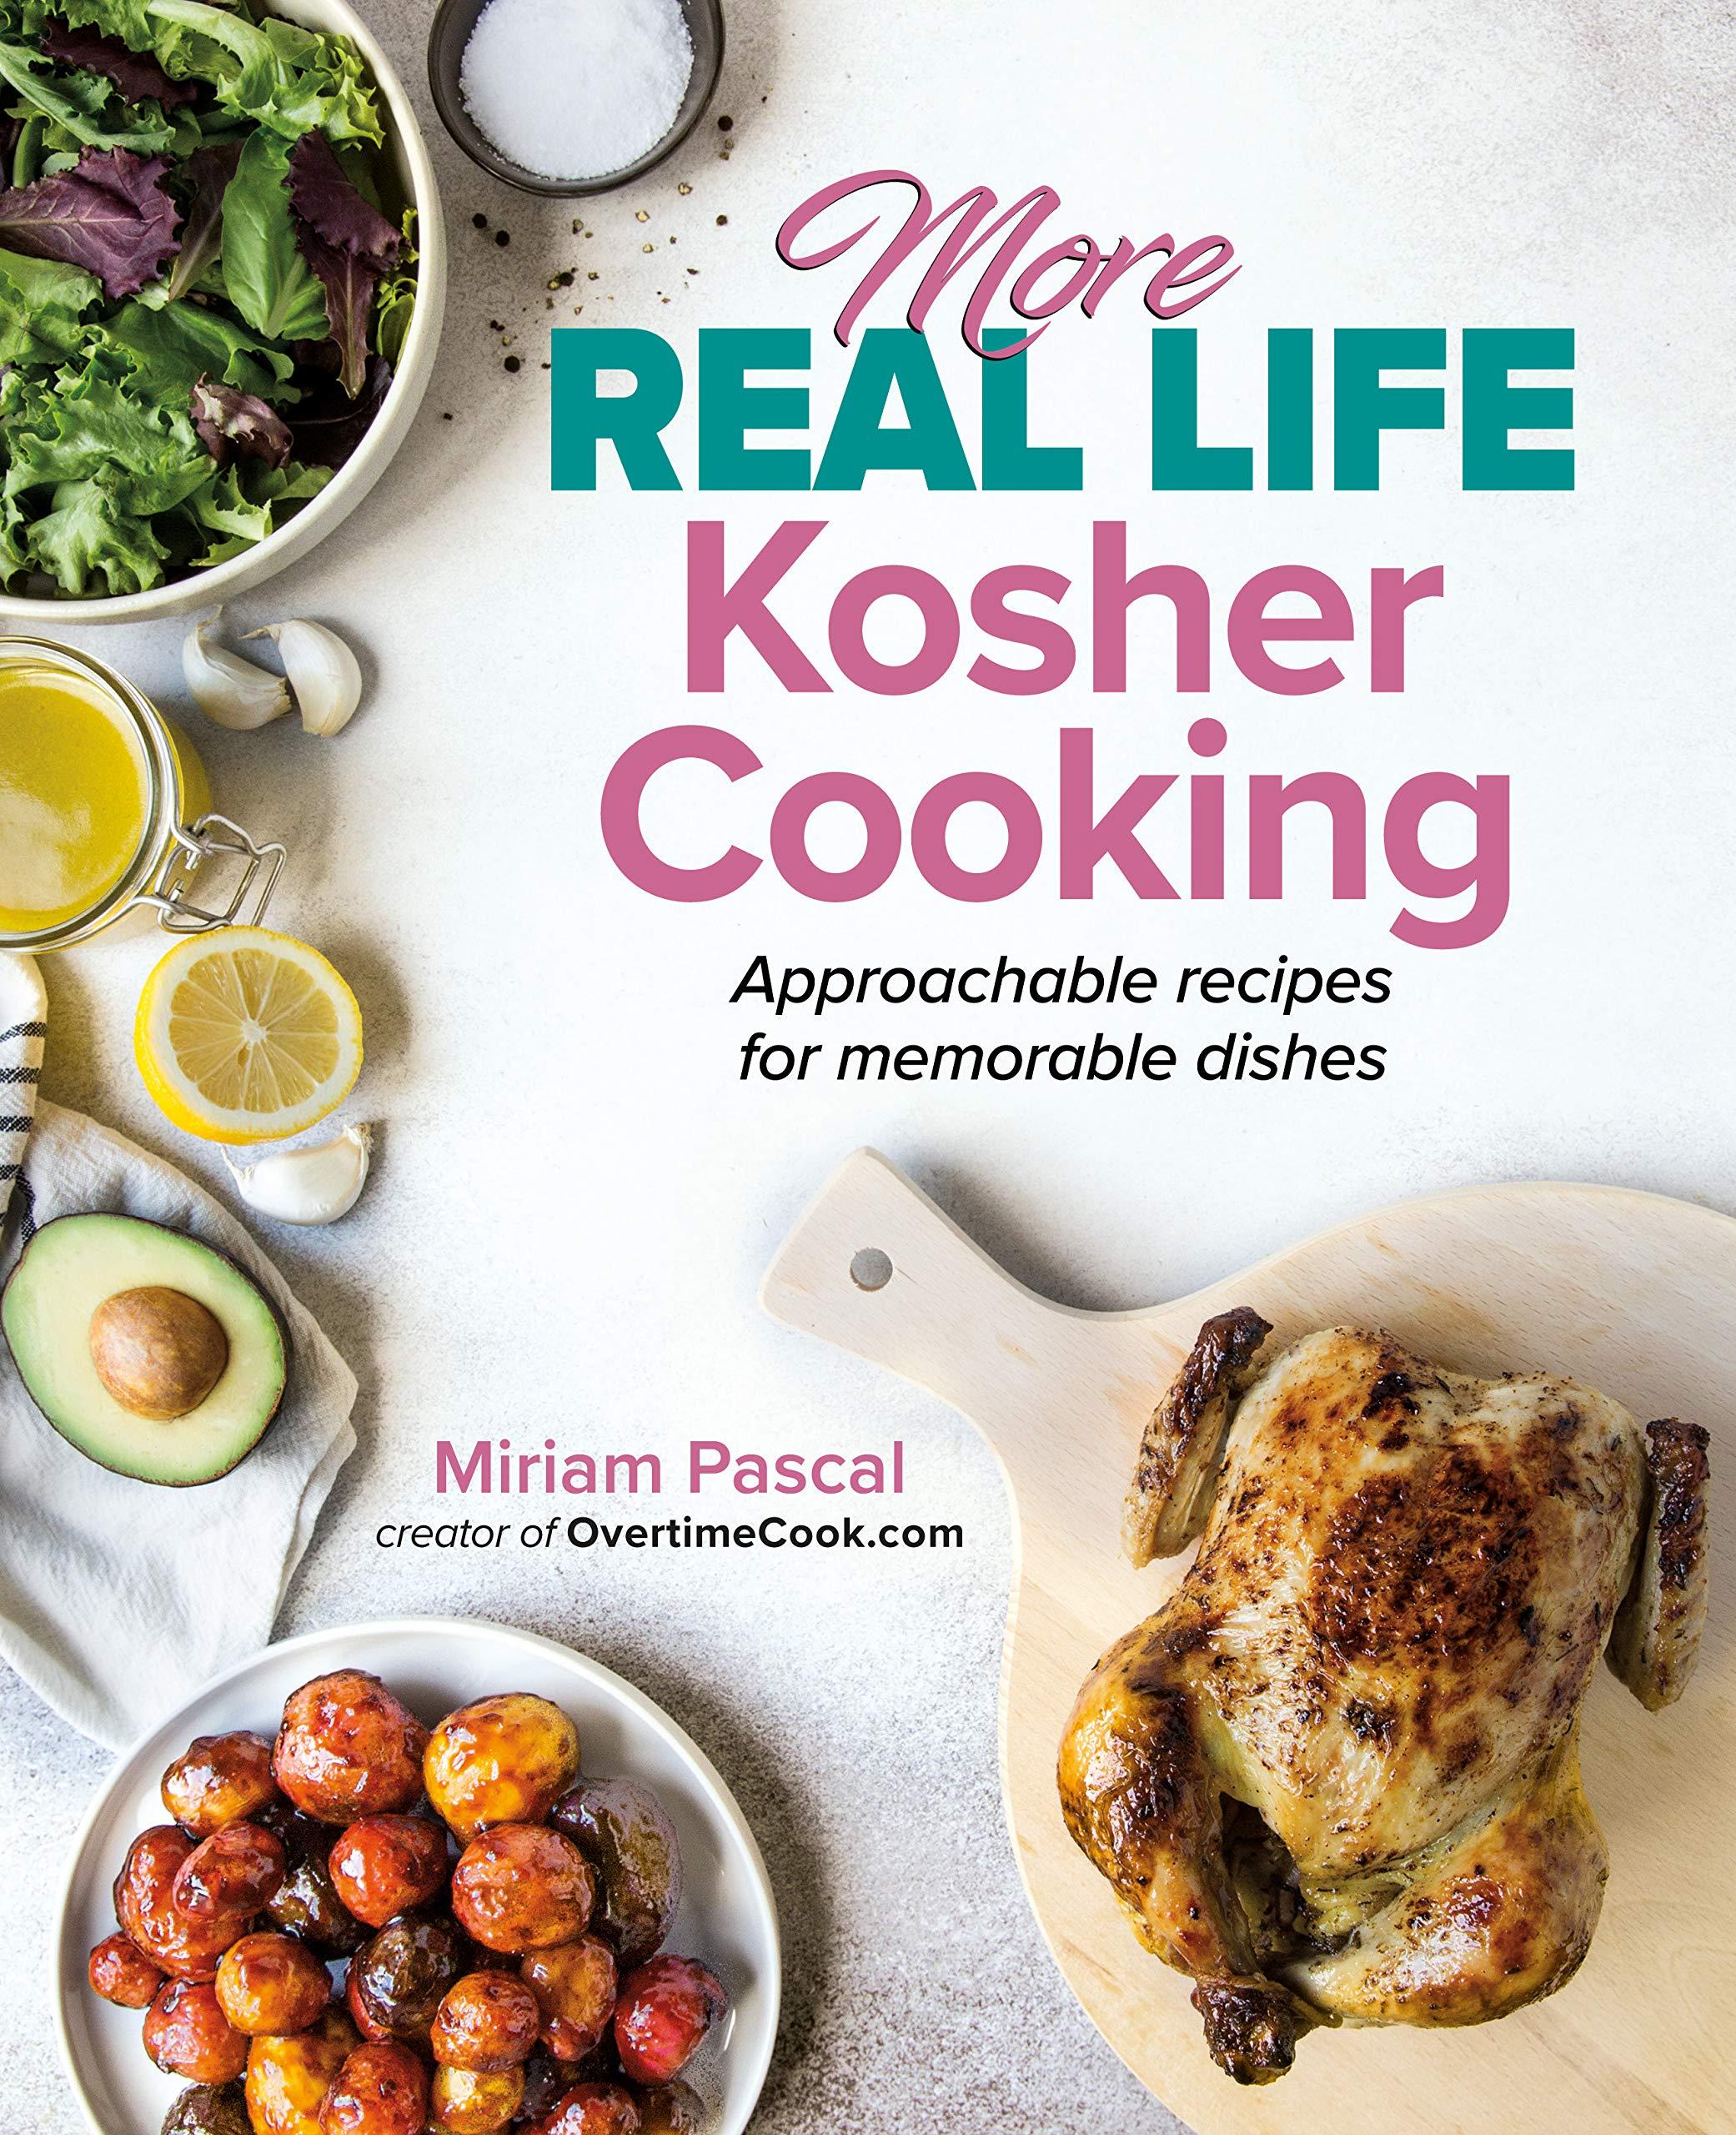 More Real Life Kosher Cooking